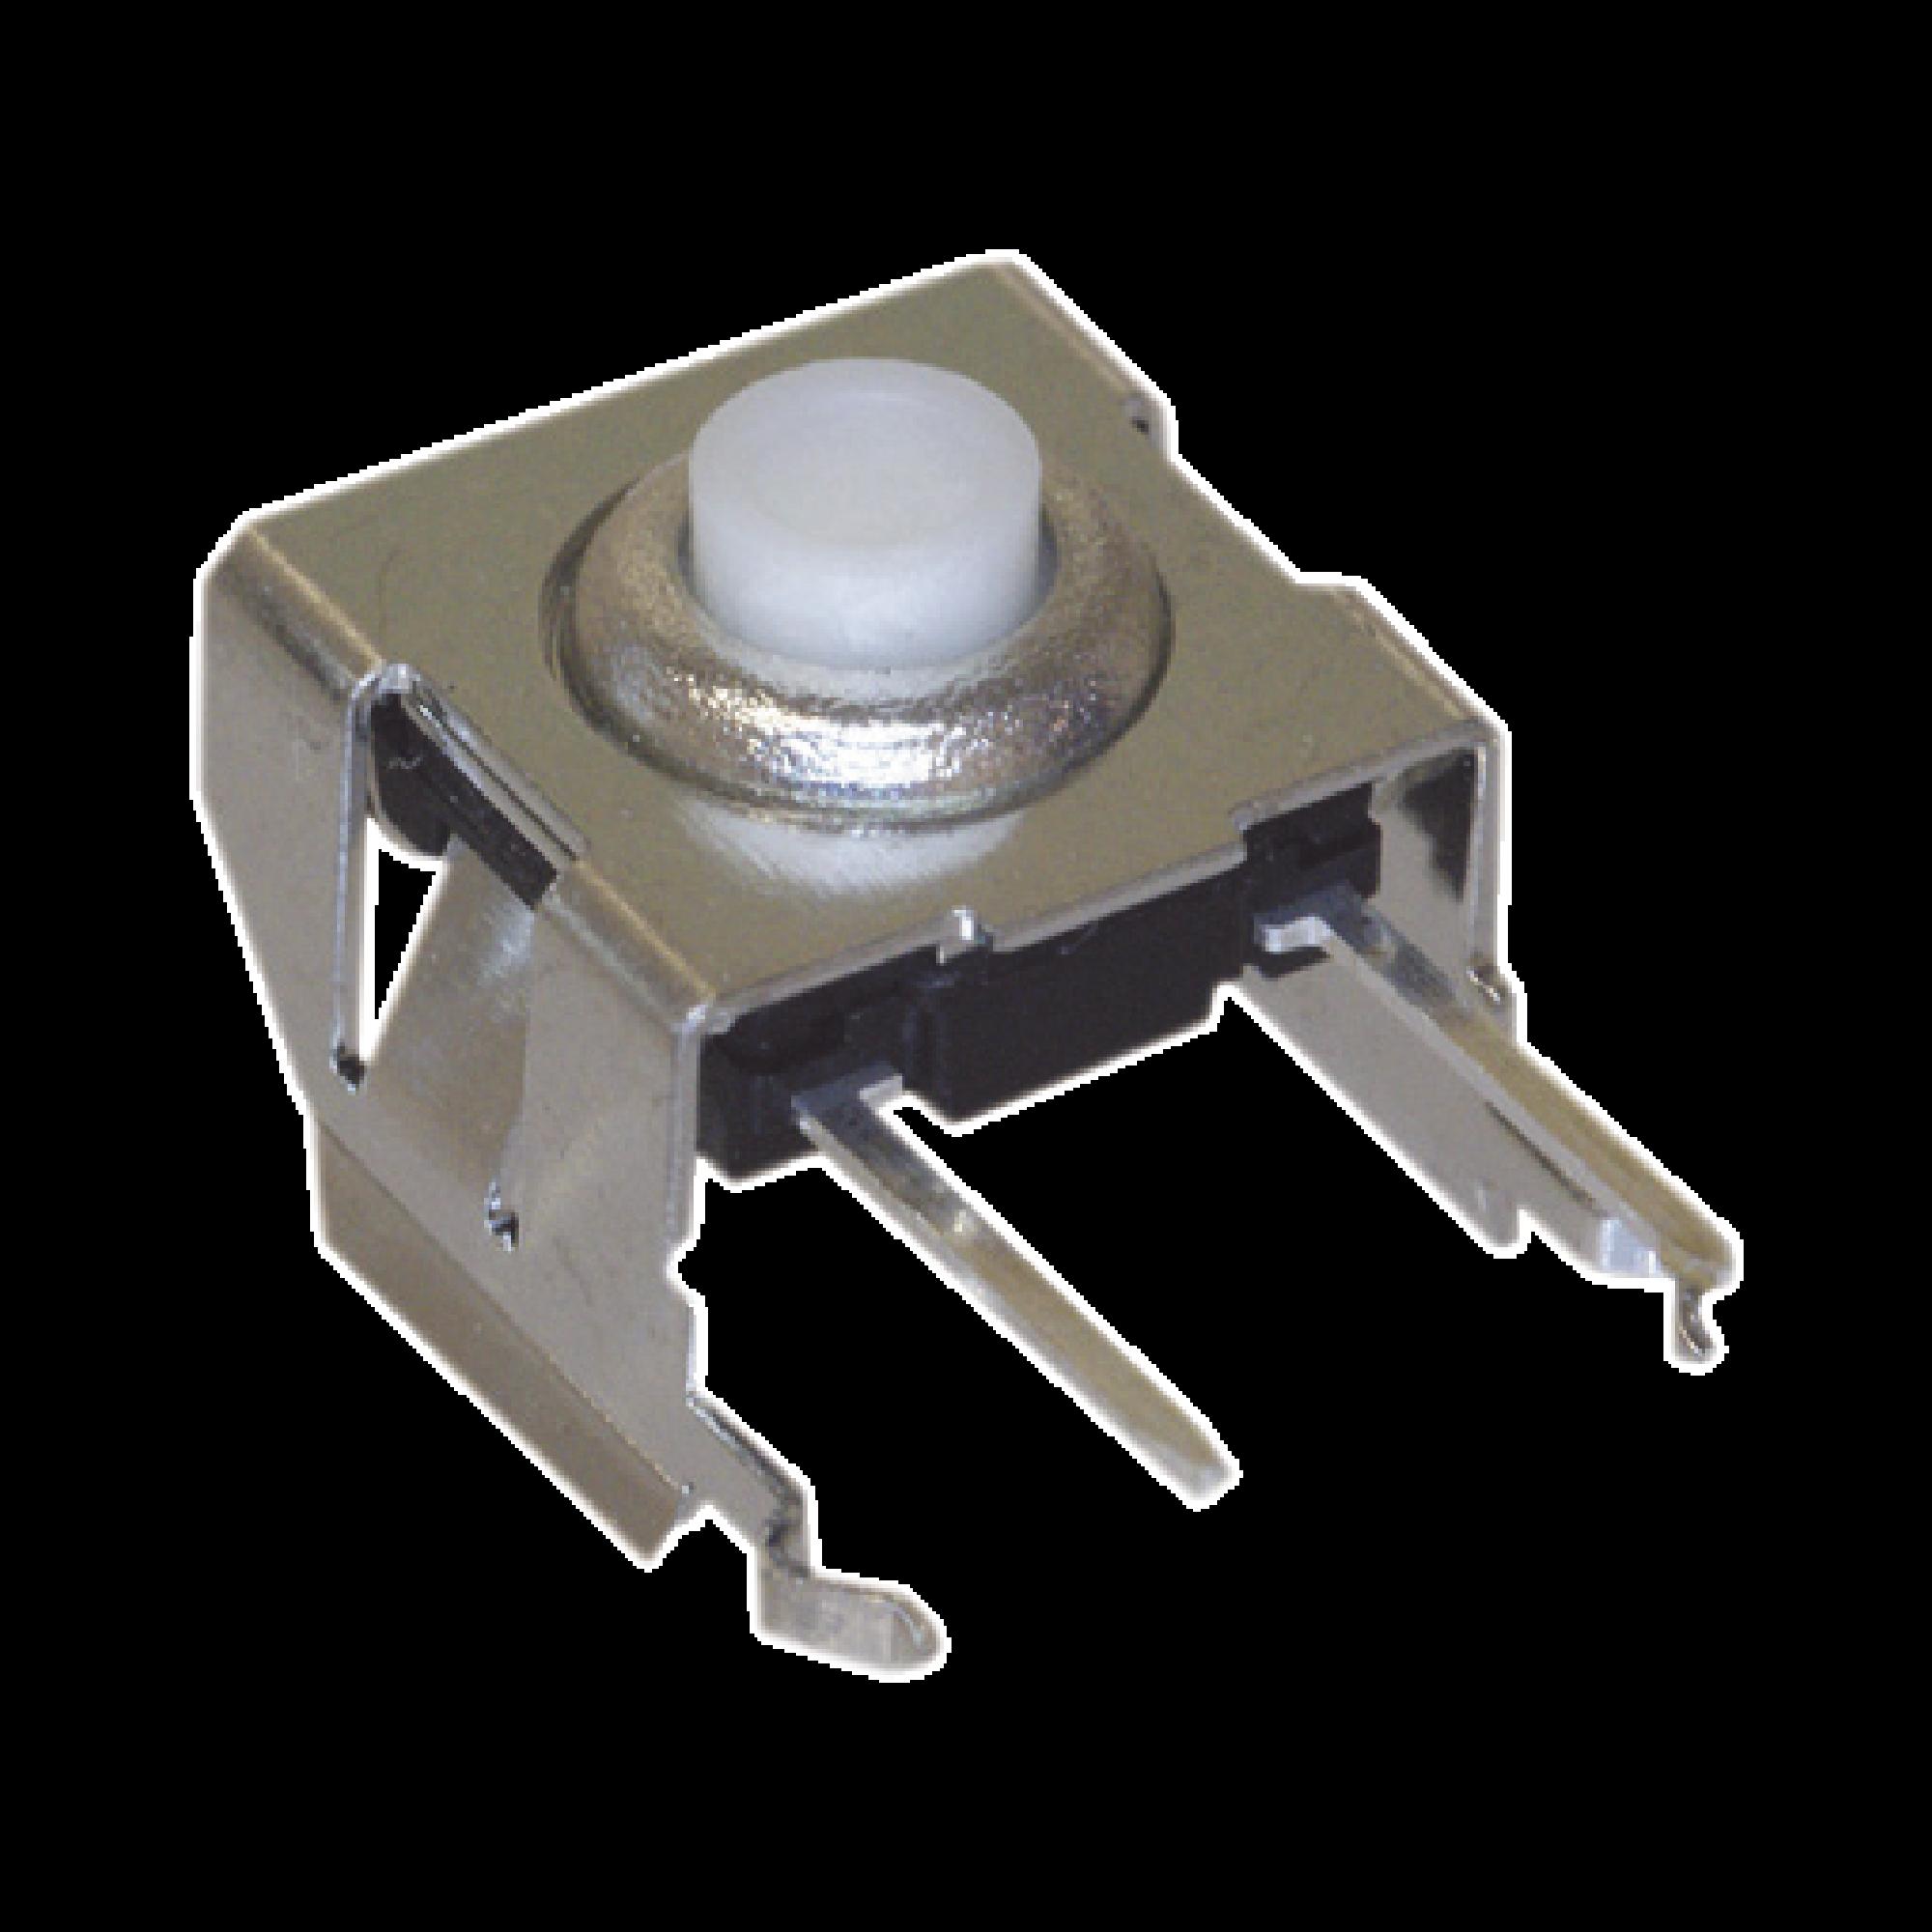 Interruptor Táctil en ángulo Recto / PCB, SPST, 50 mA, 12 Vcd (RoHS), para Mic. KMC-22